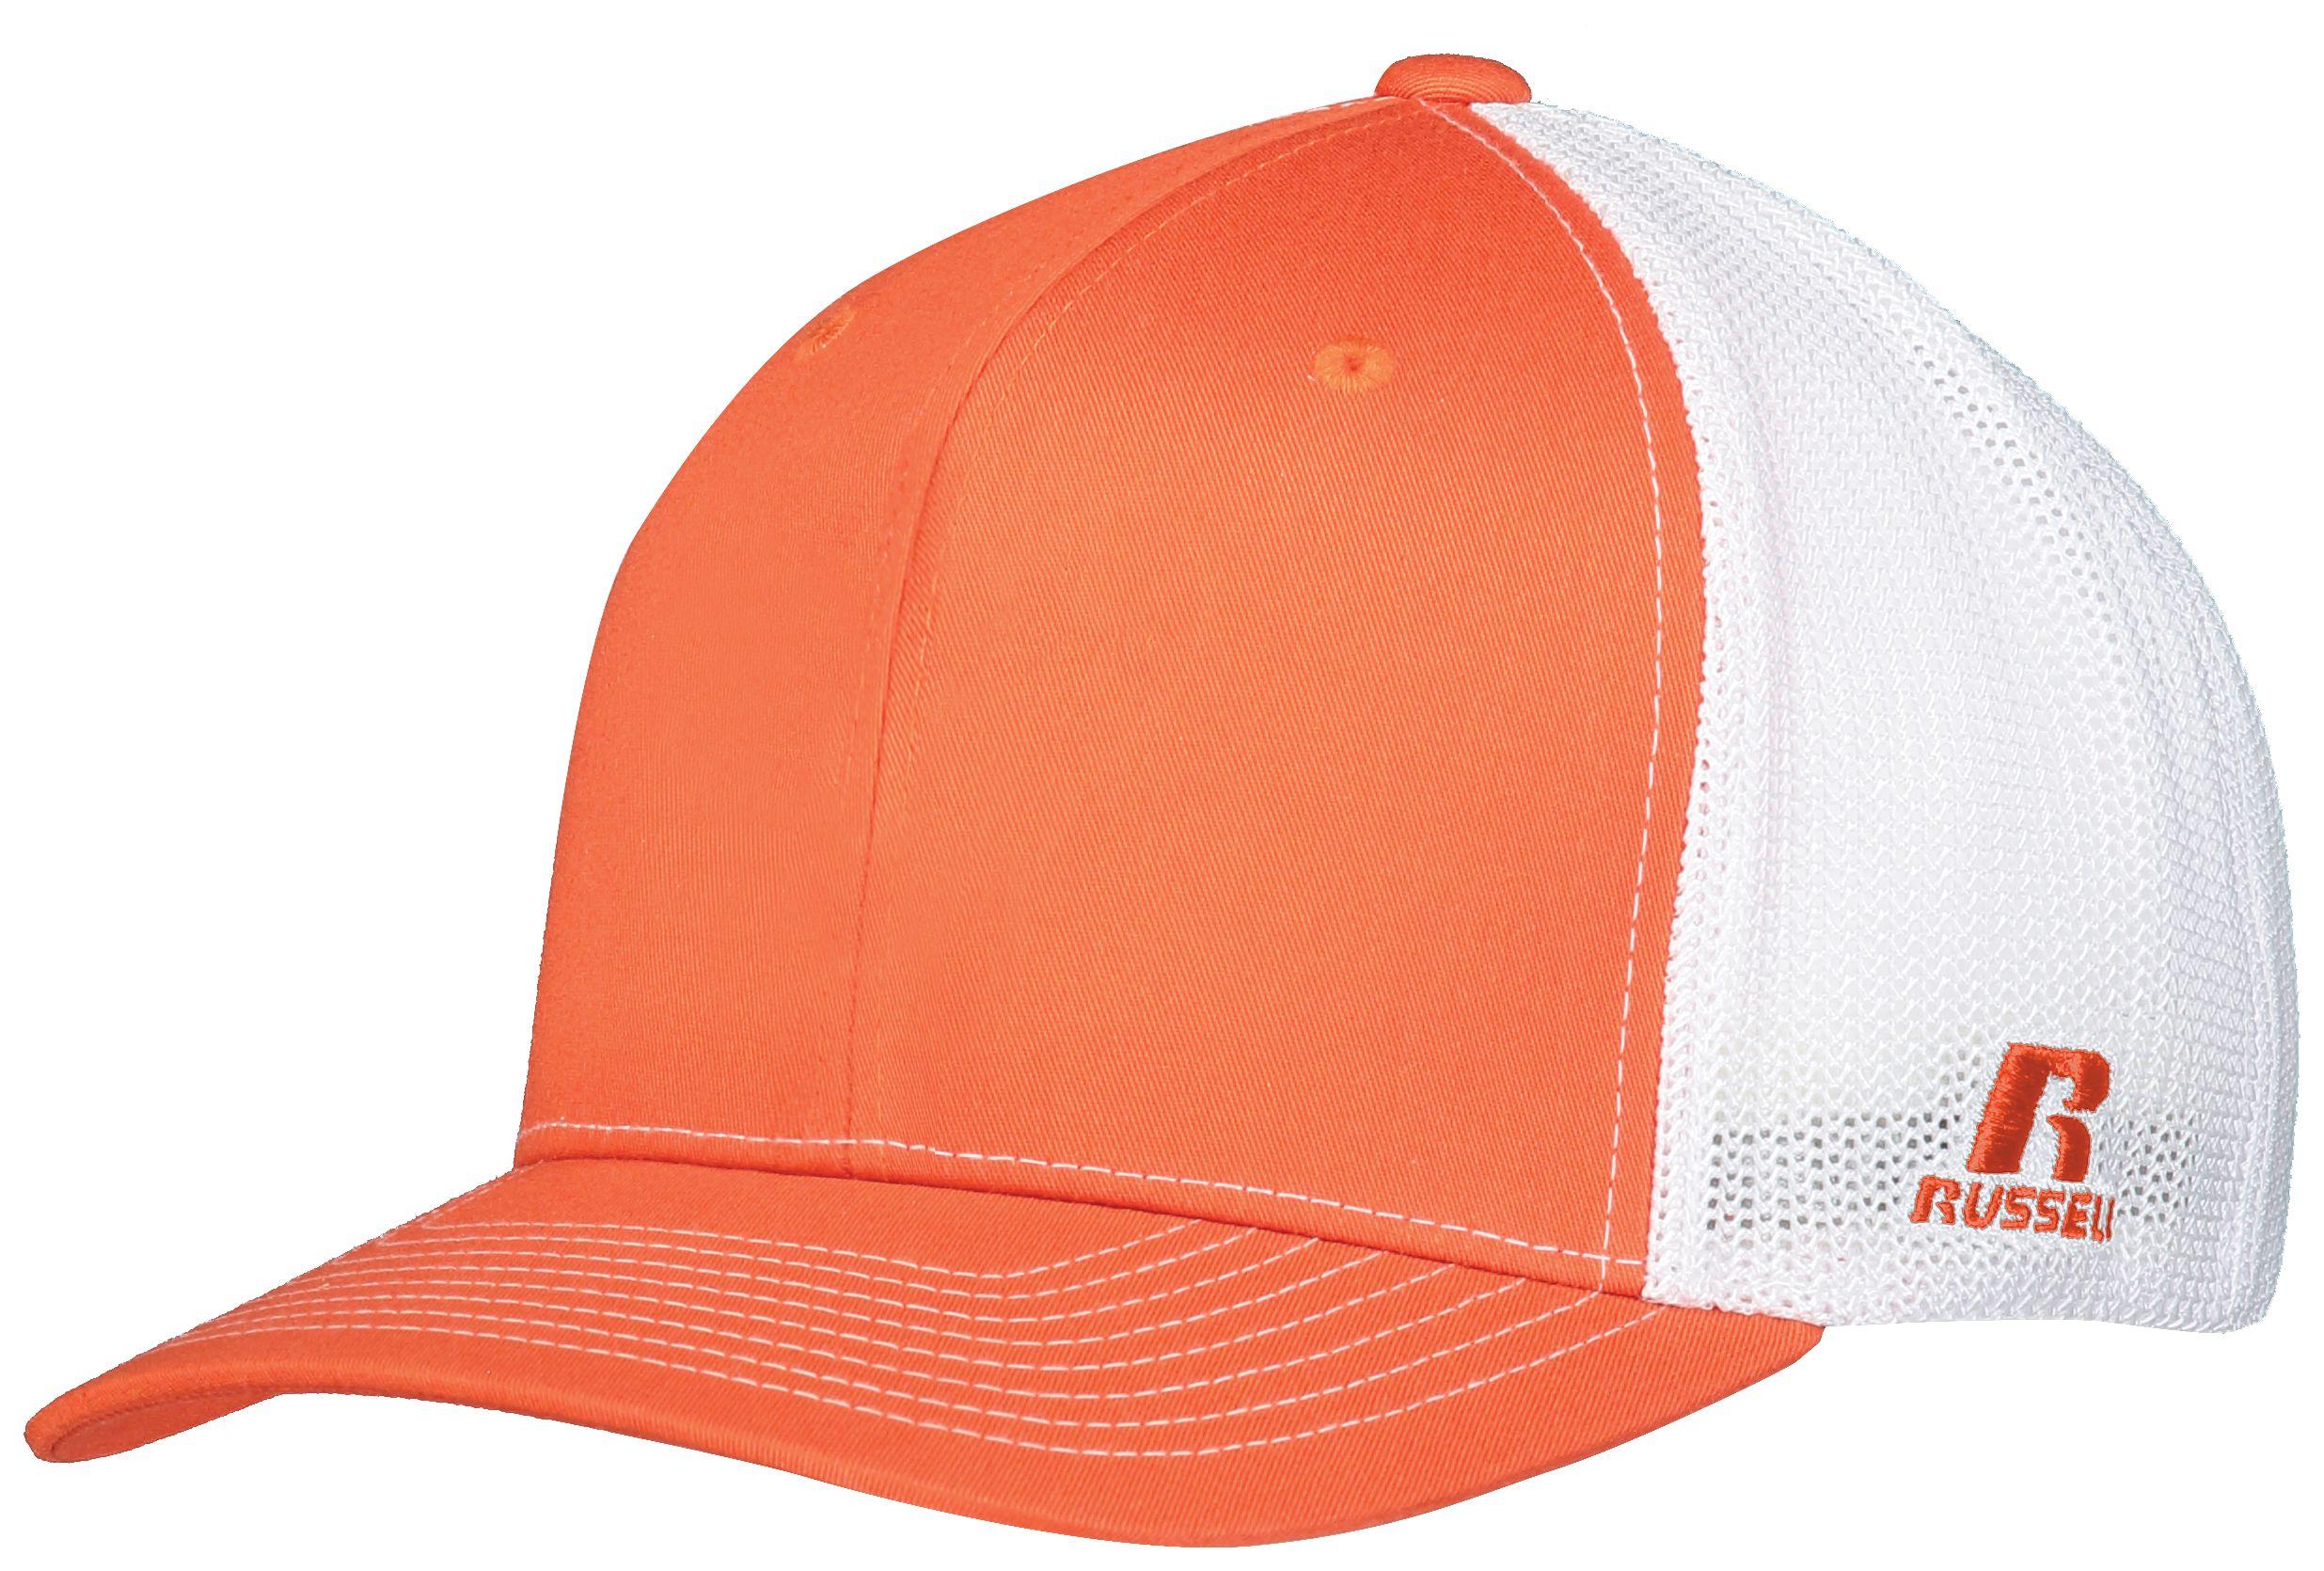 Youth Flexfit Twill Mesh Cap - Burnt Orange/white